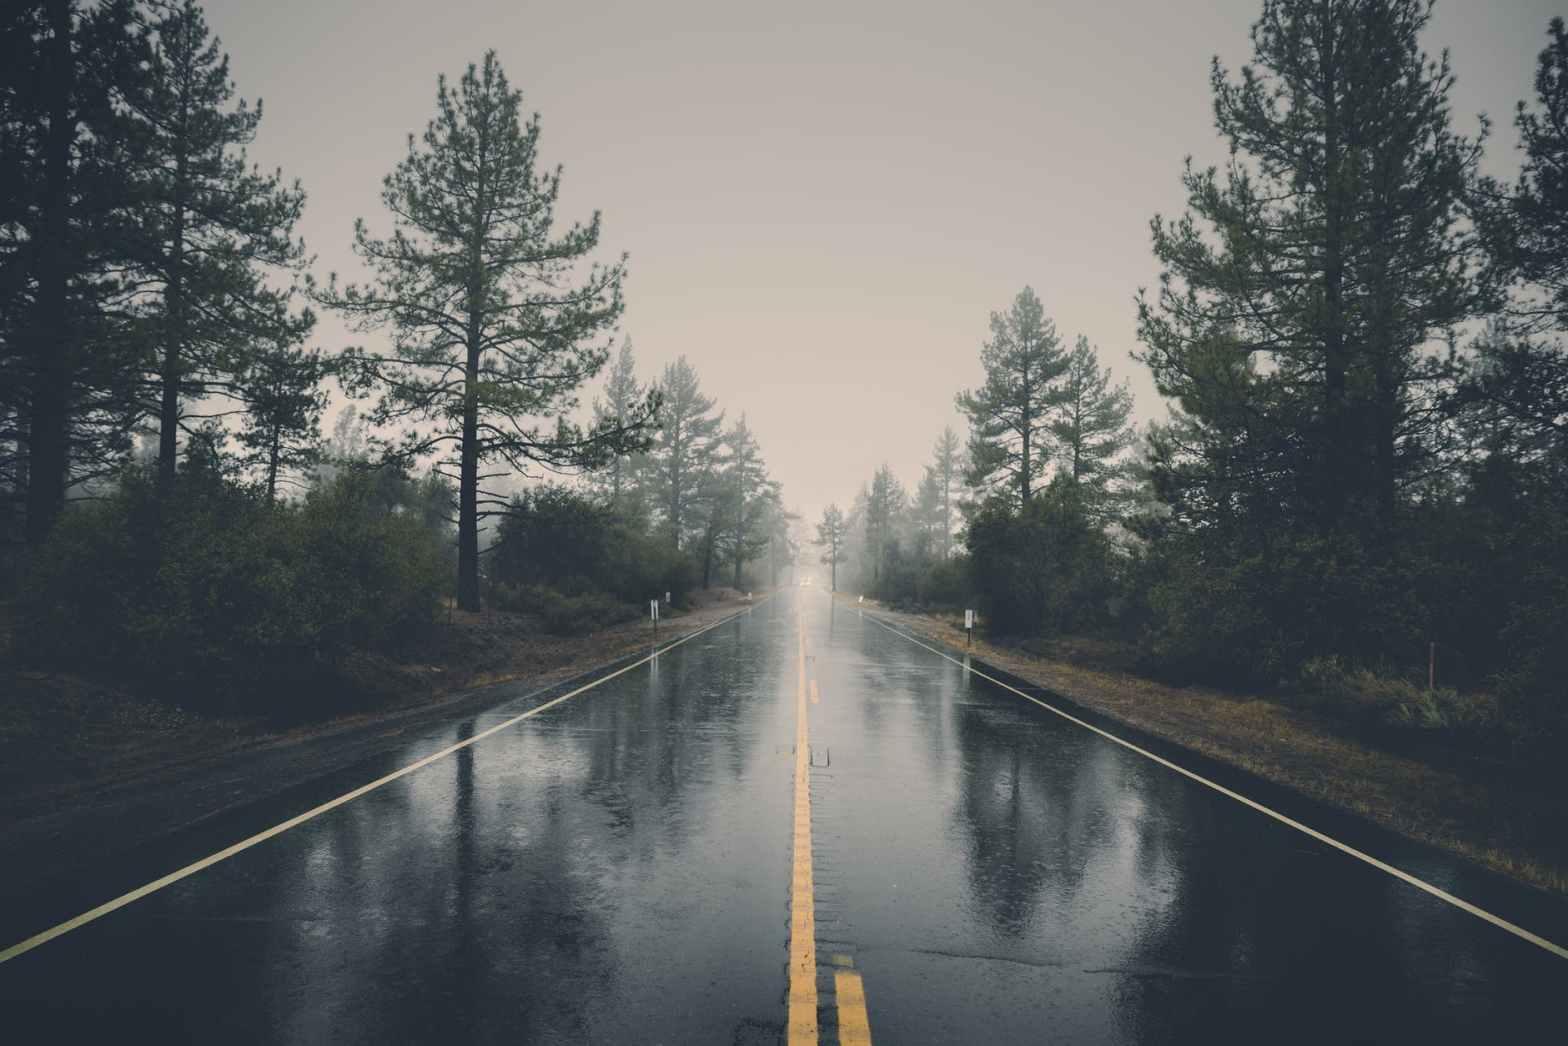 road between pine trees